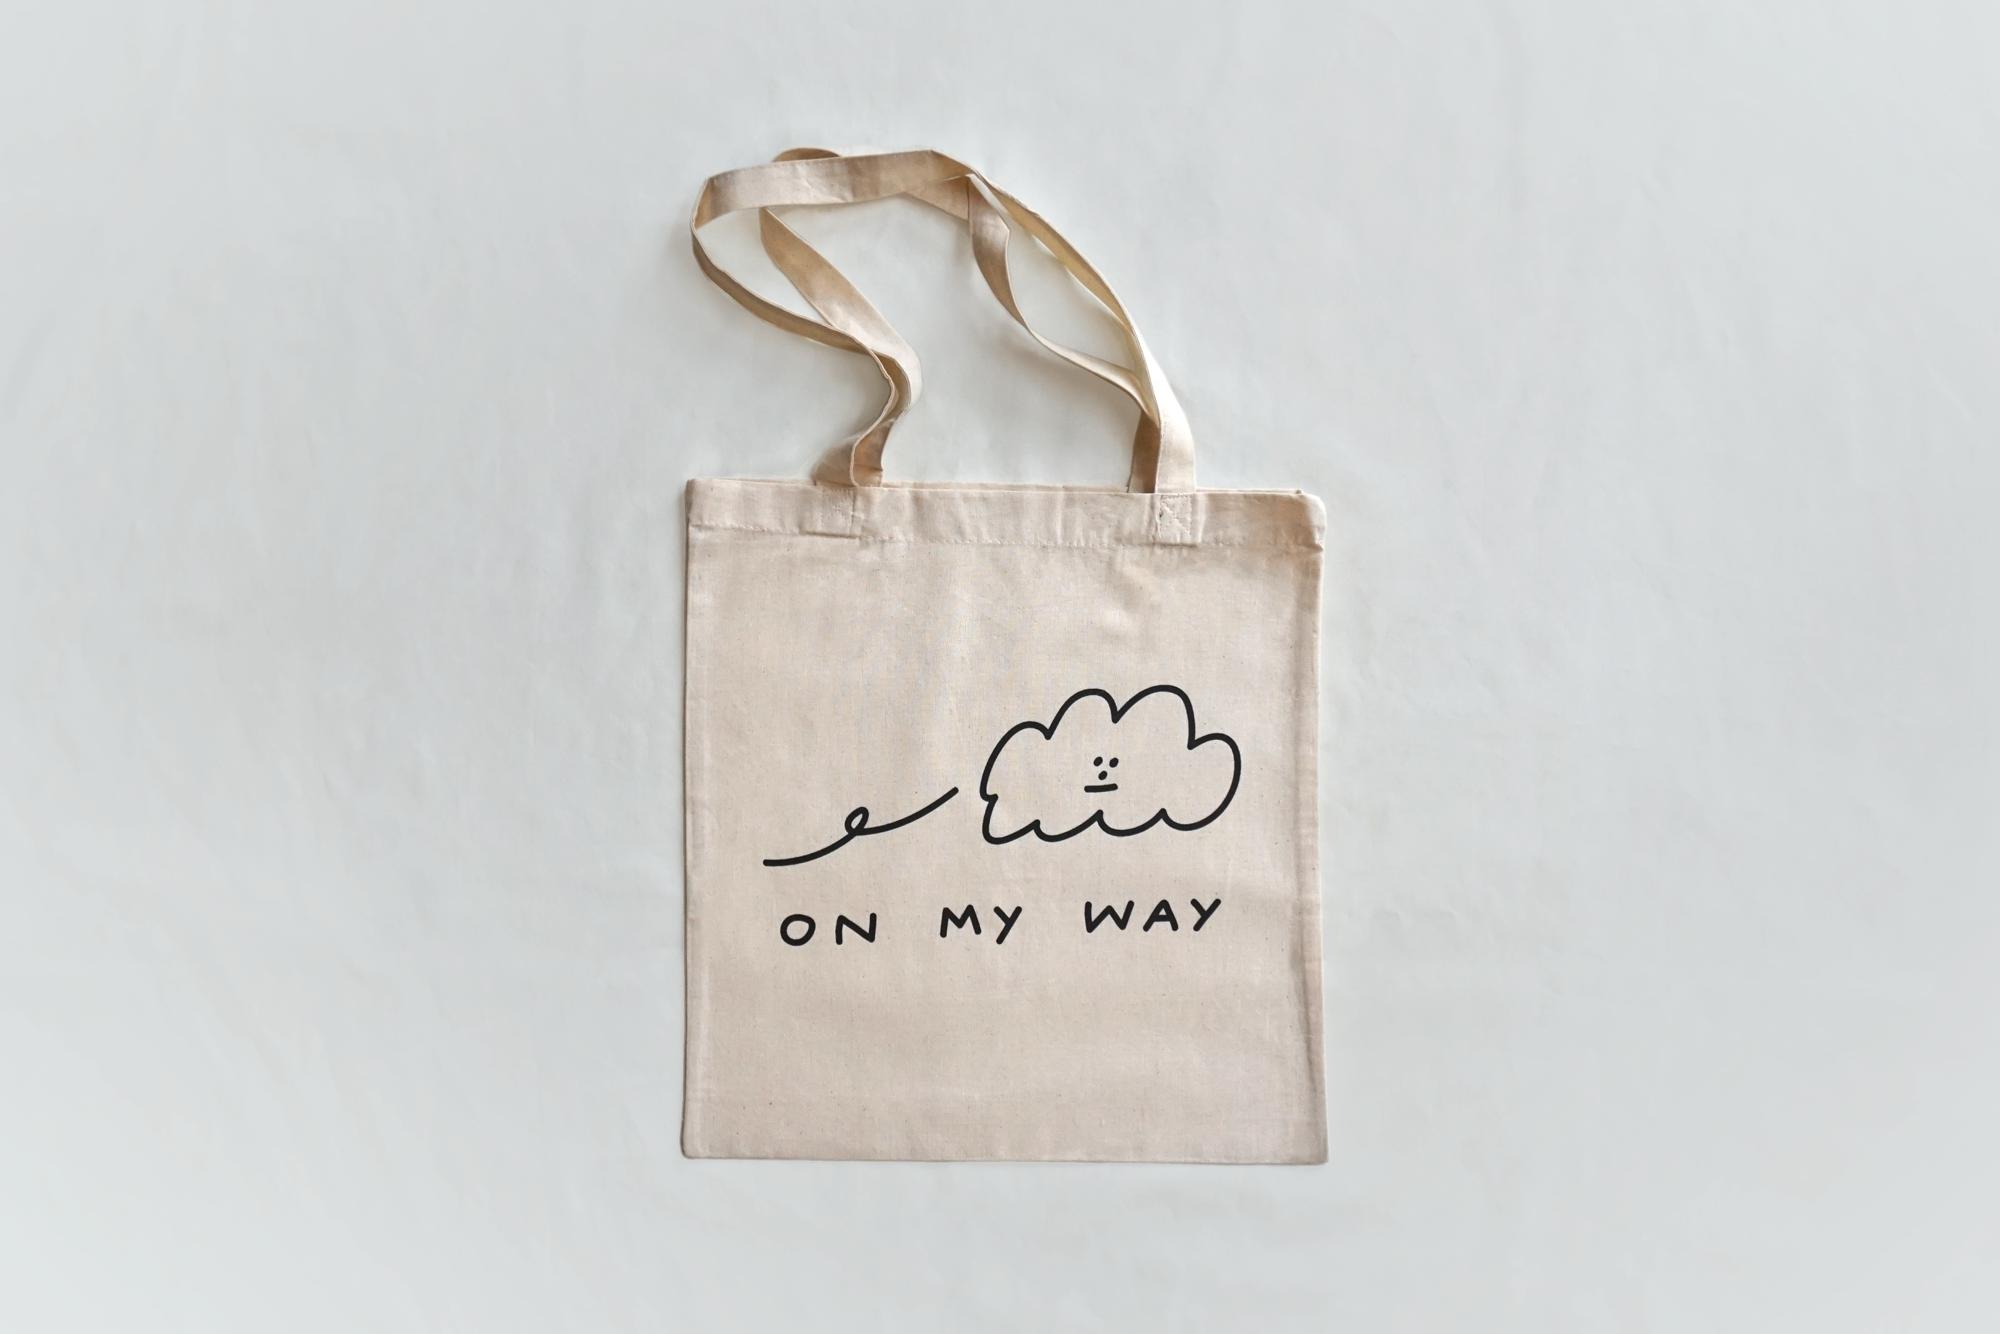 'On My Way' Tote Bag